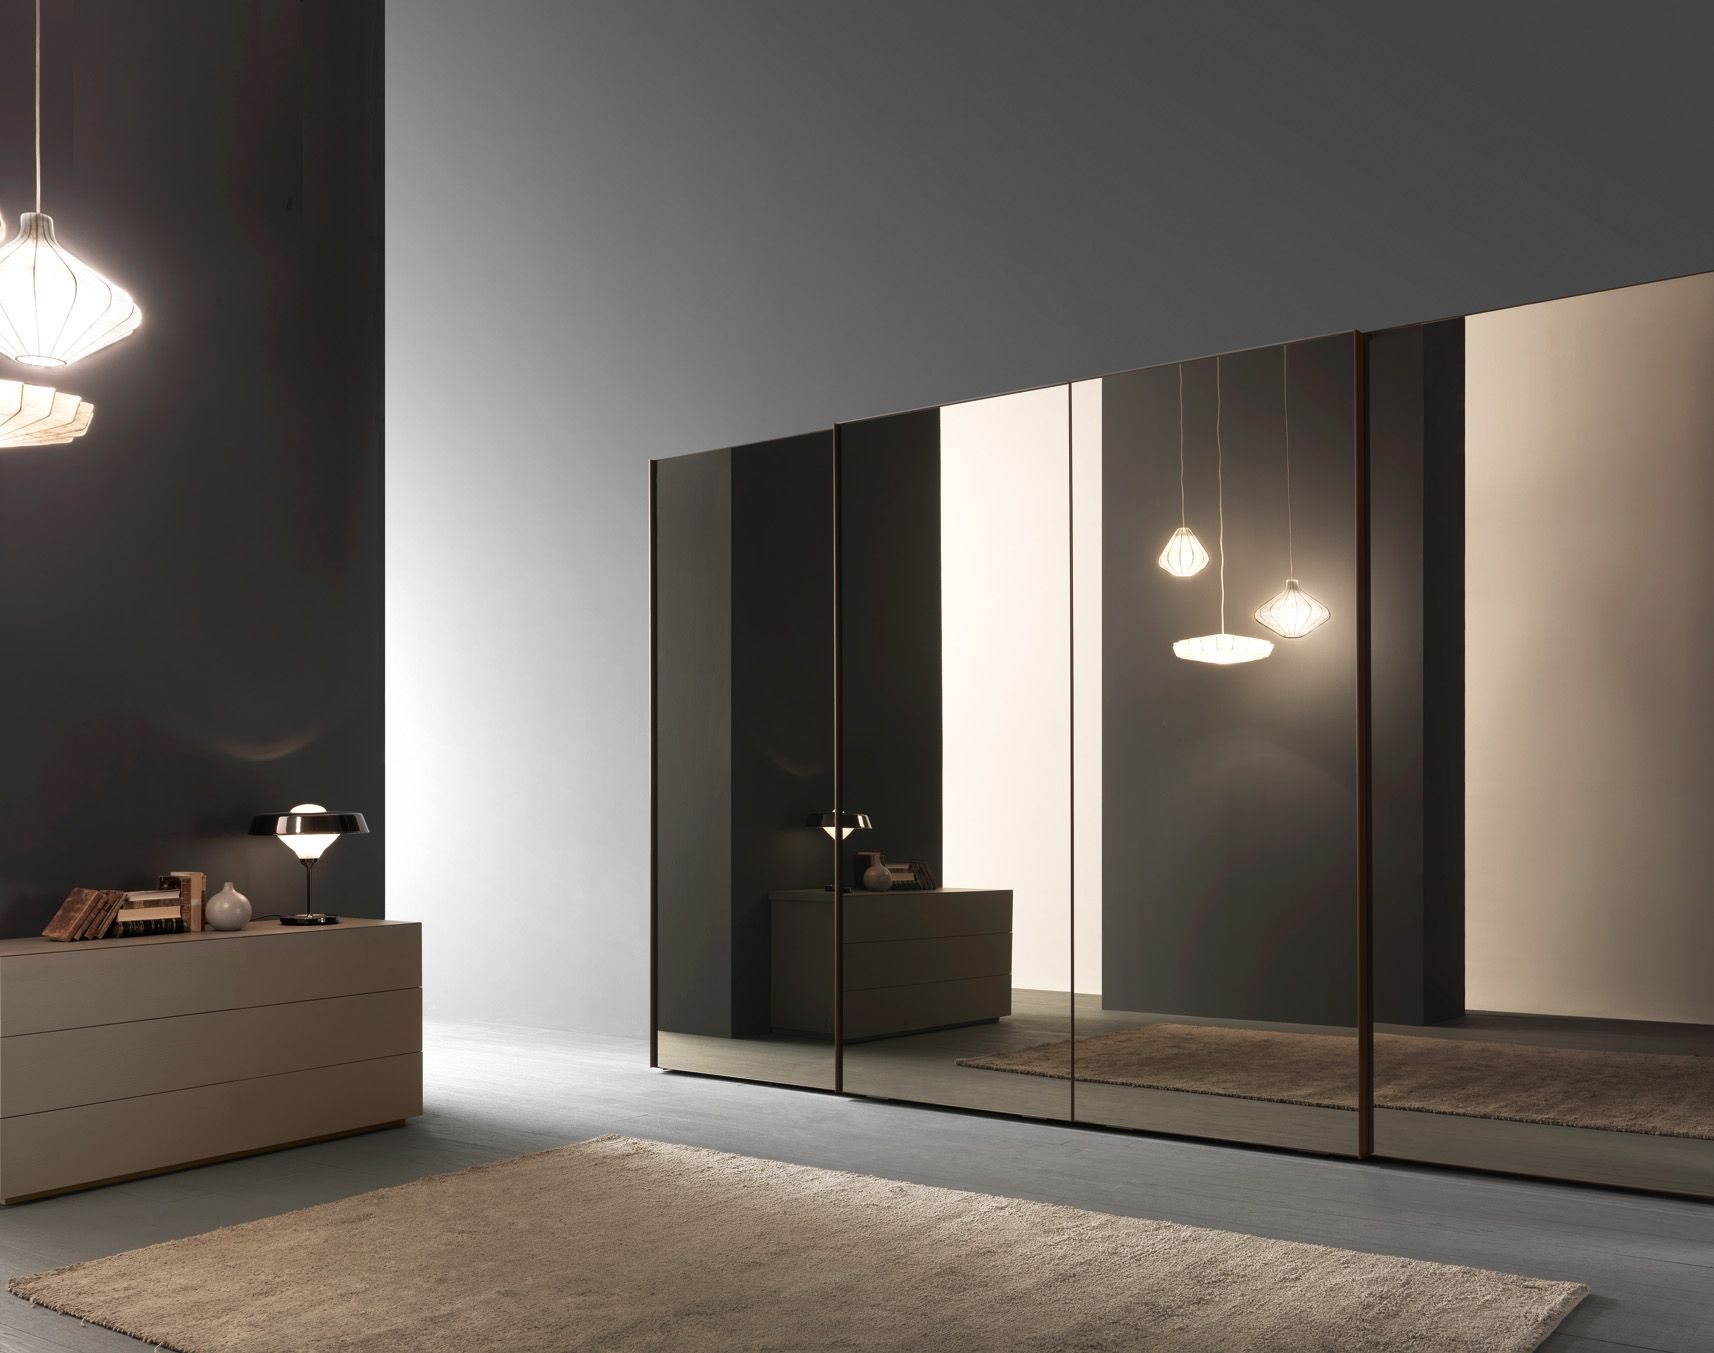 Presotto #wardrobe with glass sliding doors bronze mirror panels